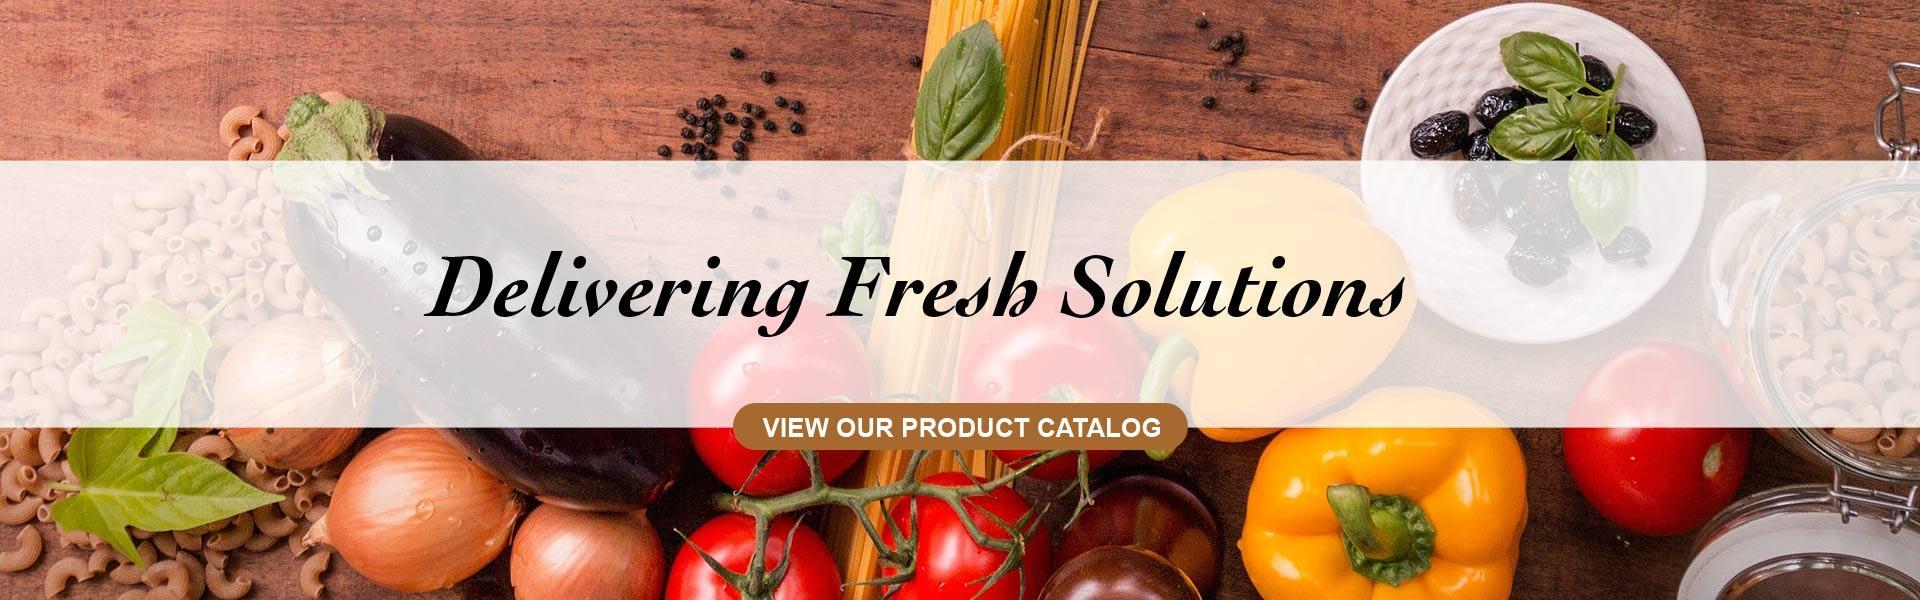 Cotati Food Service - Delivering Fresh Solutions